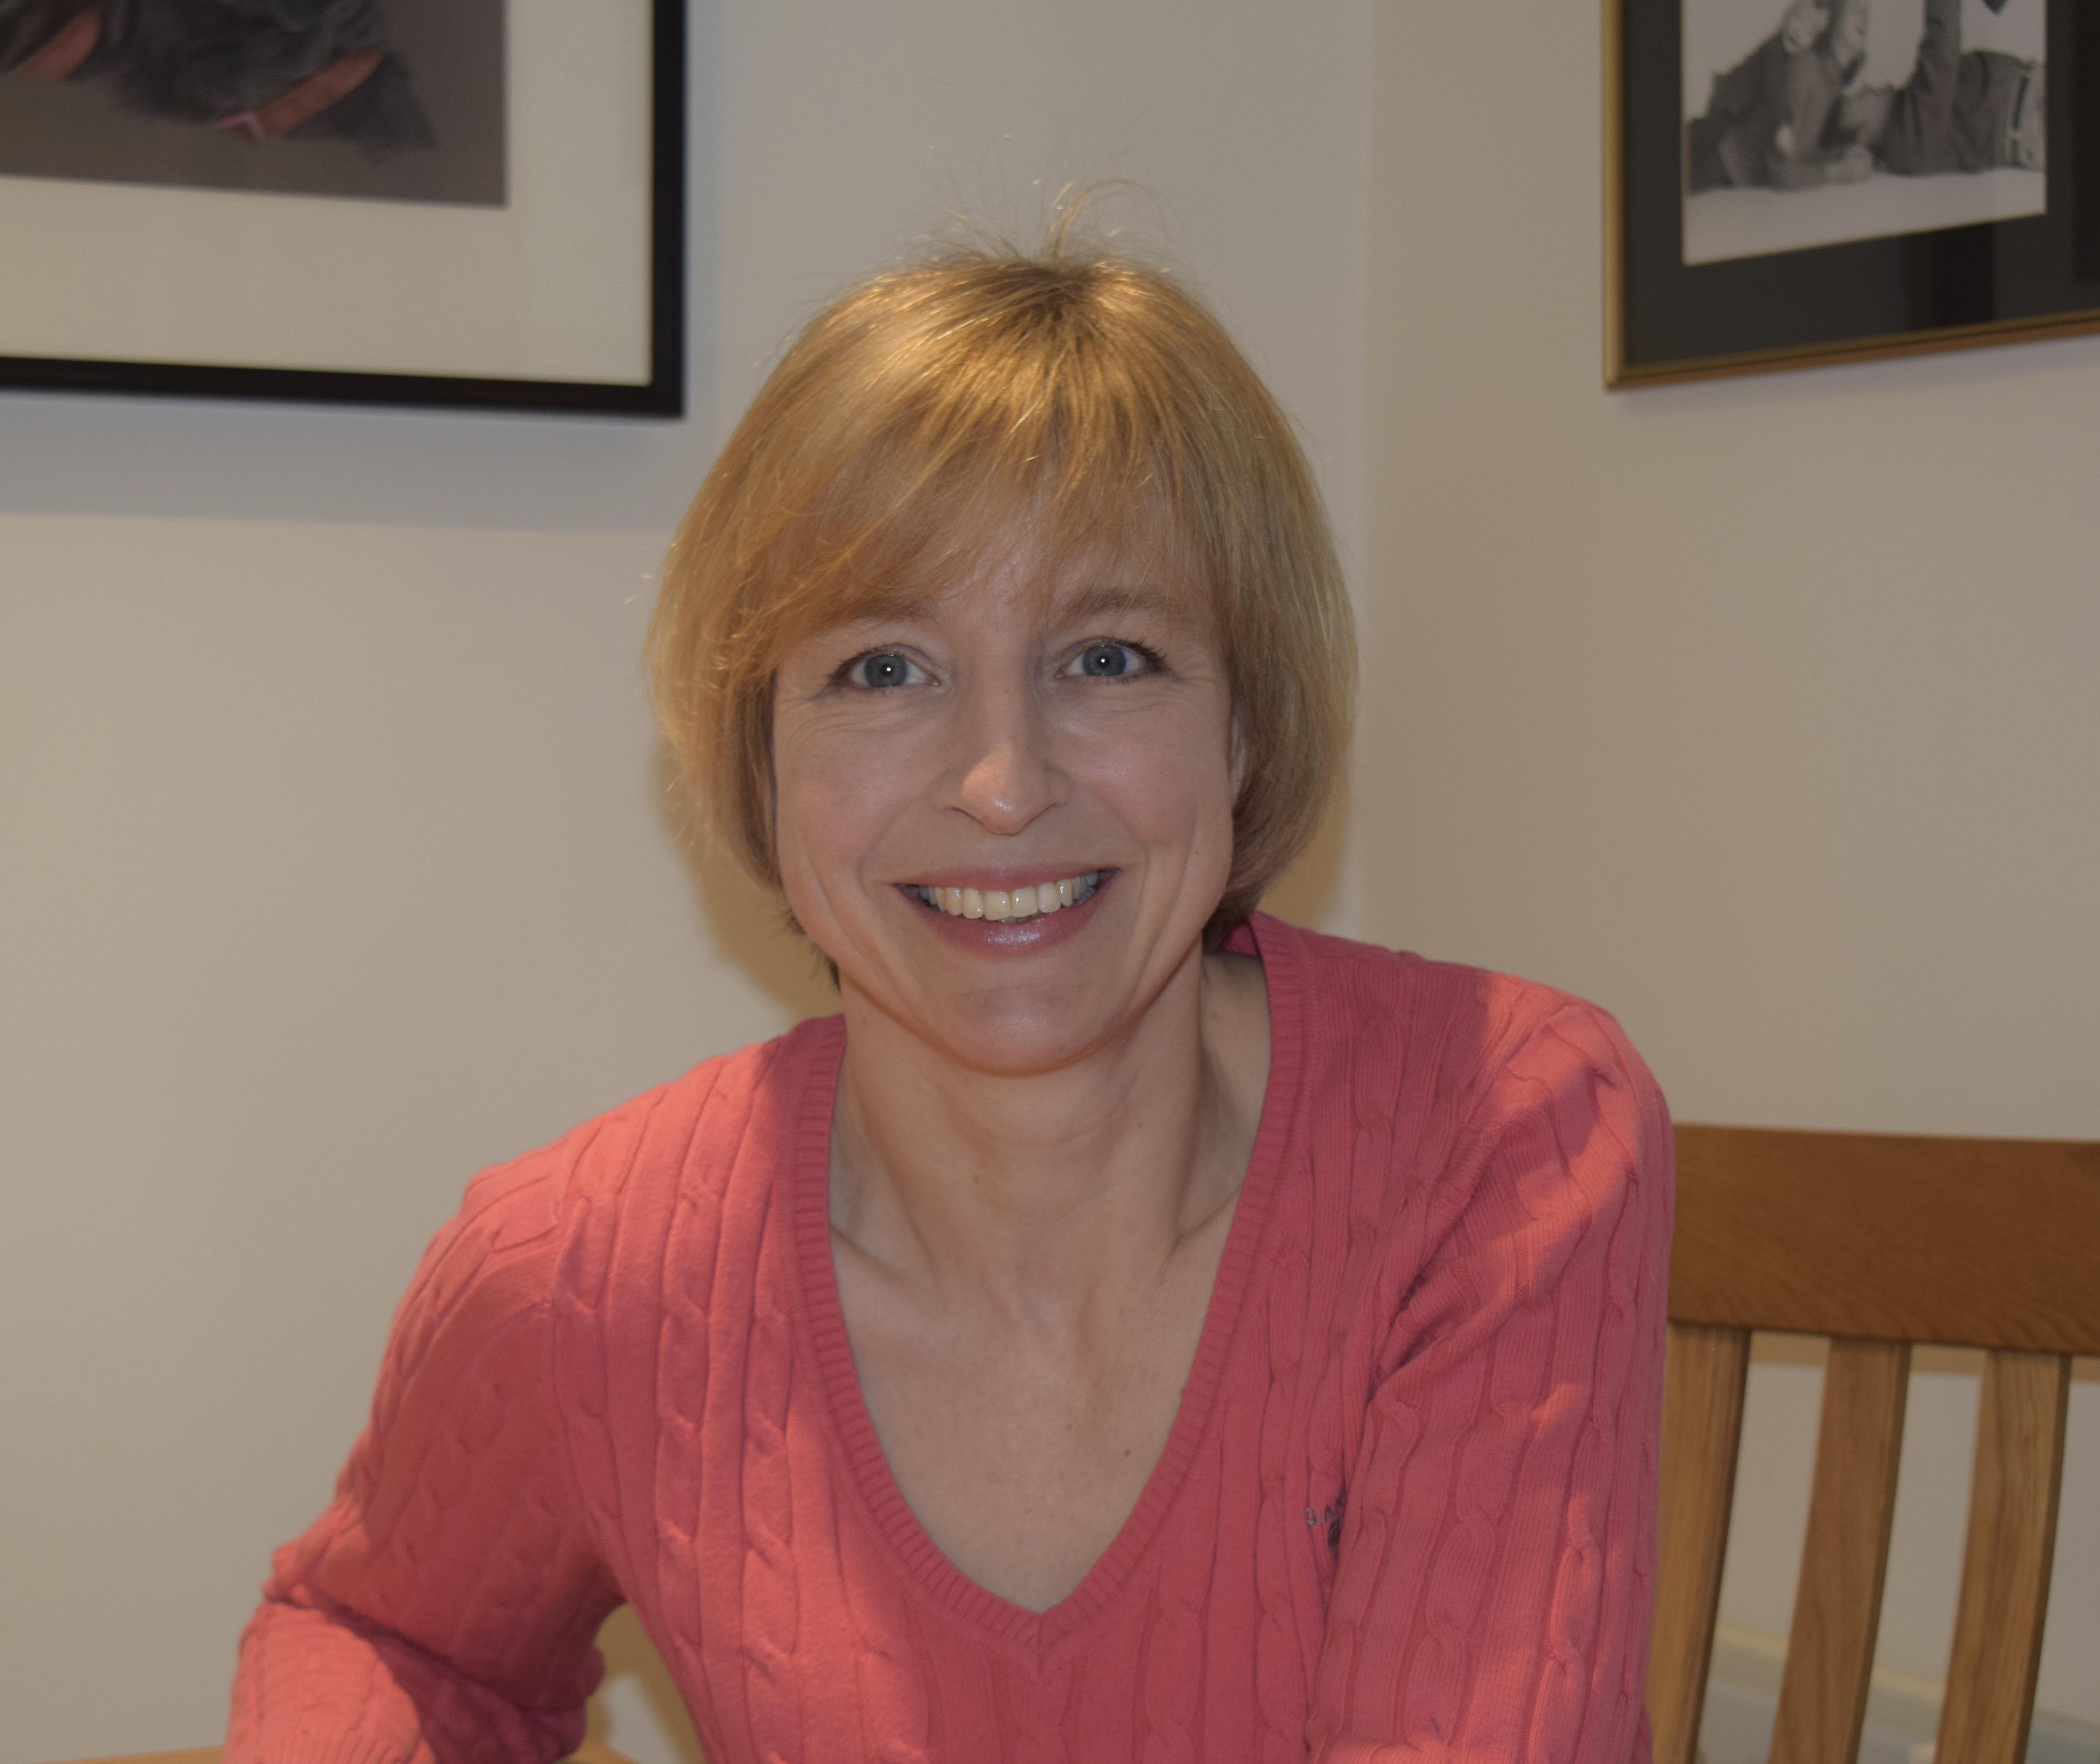 Dr Tanya Bleiker